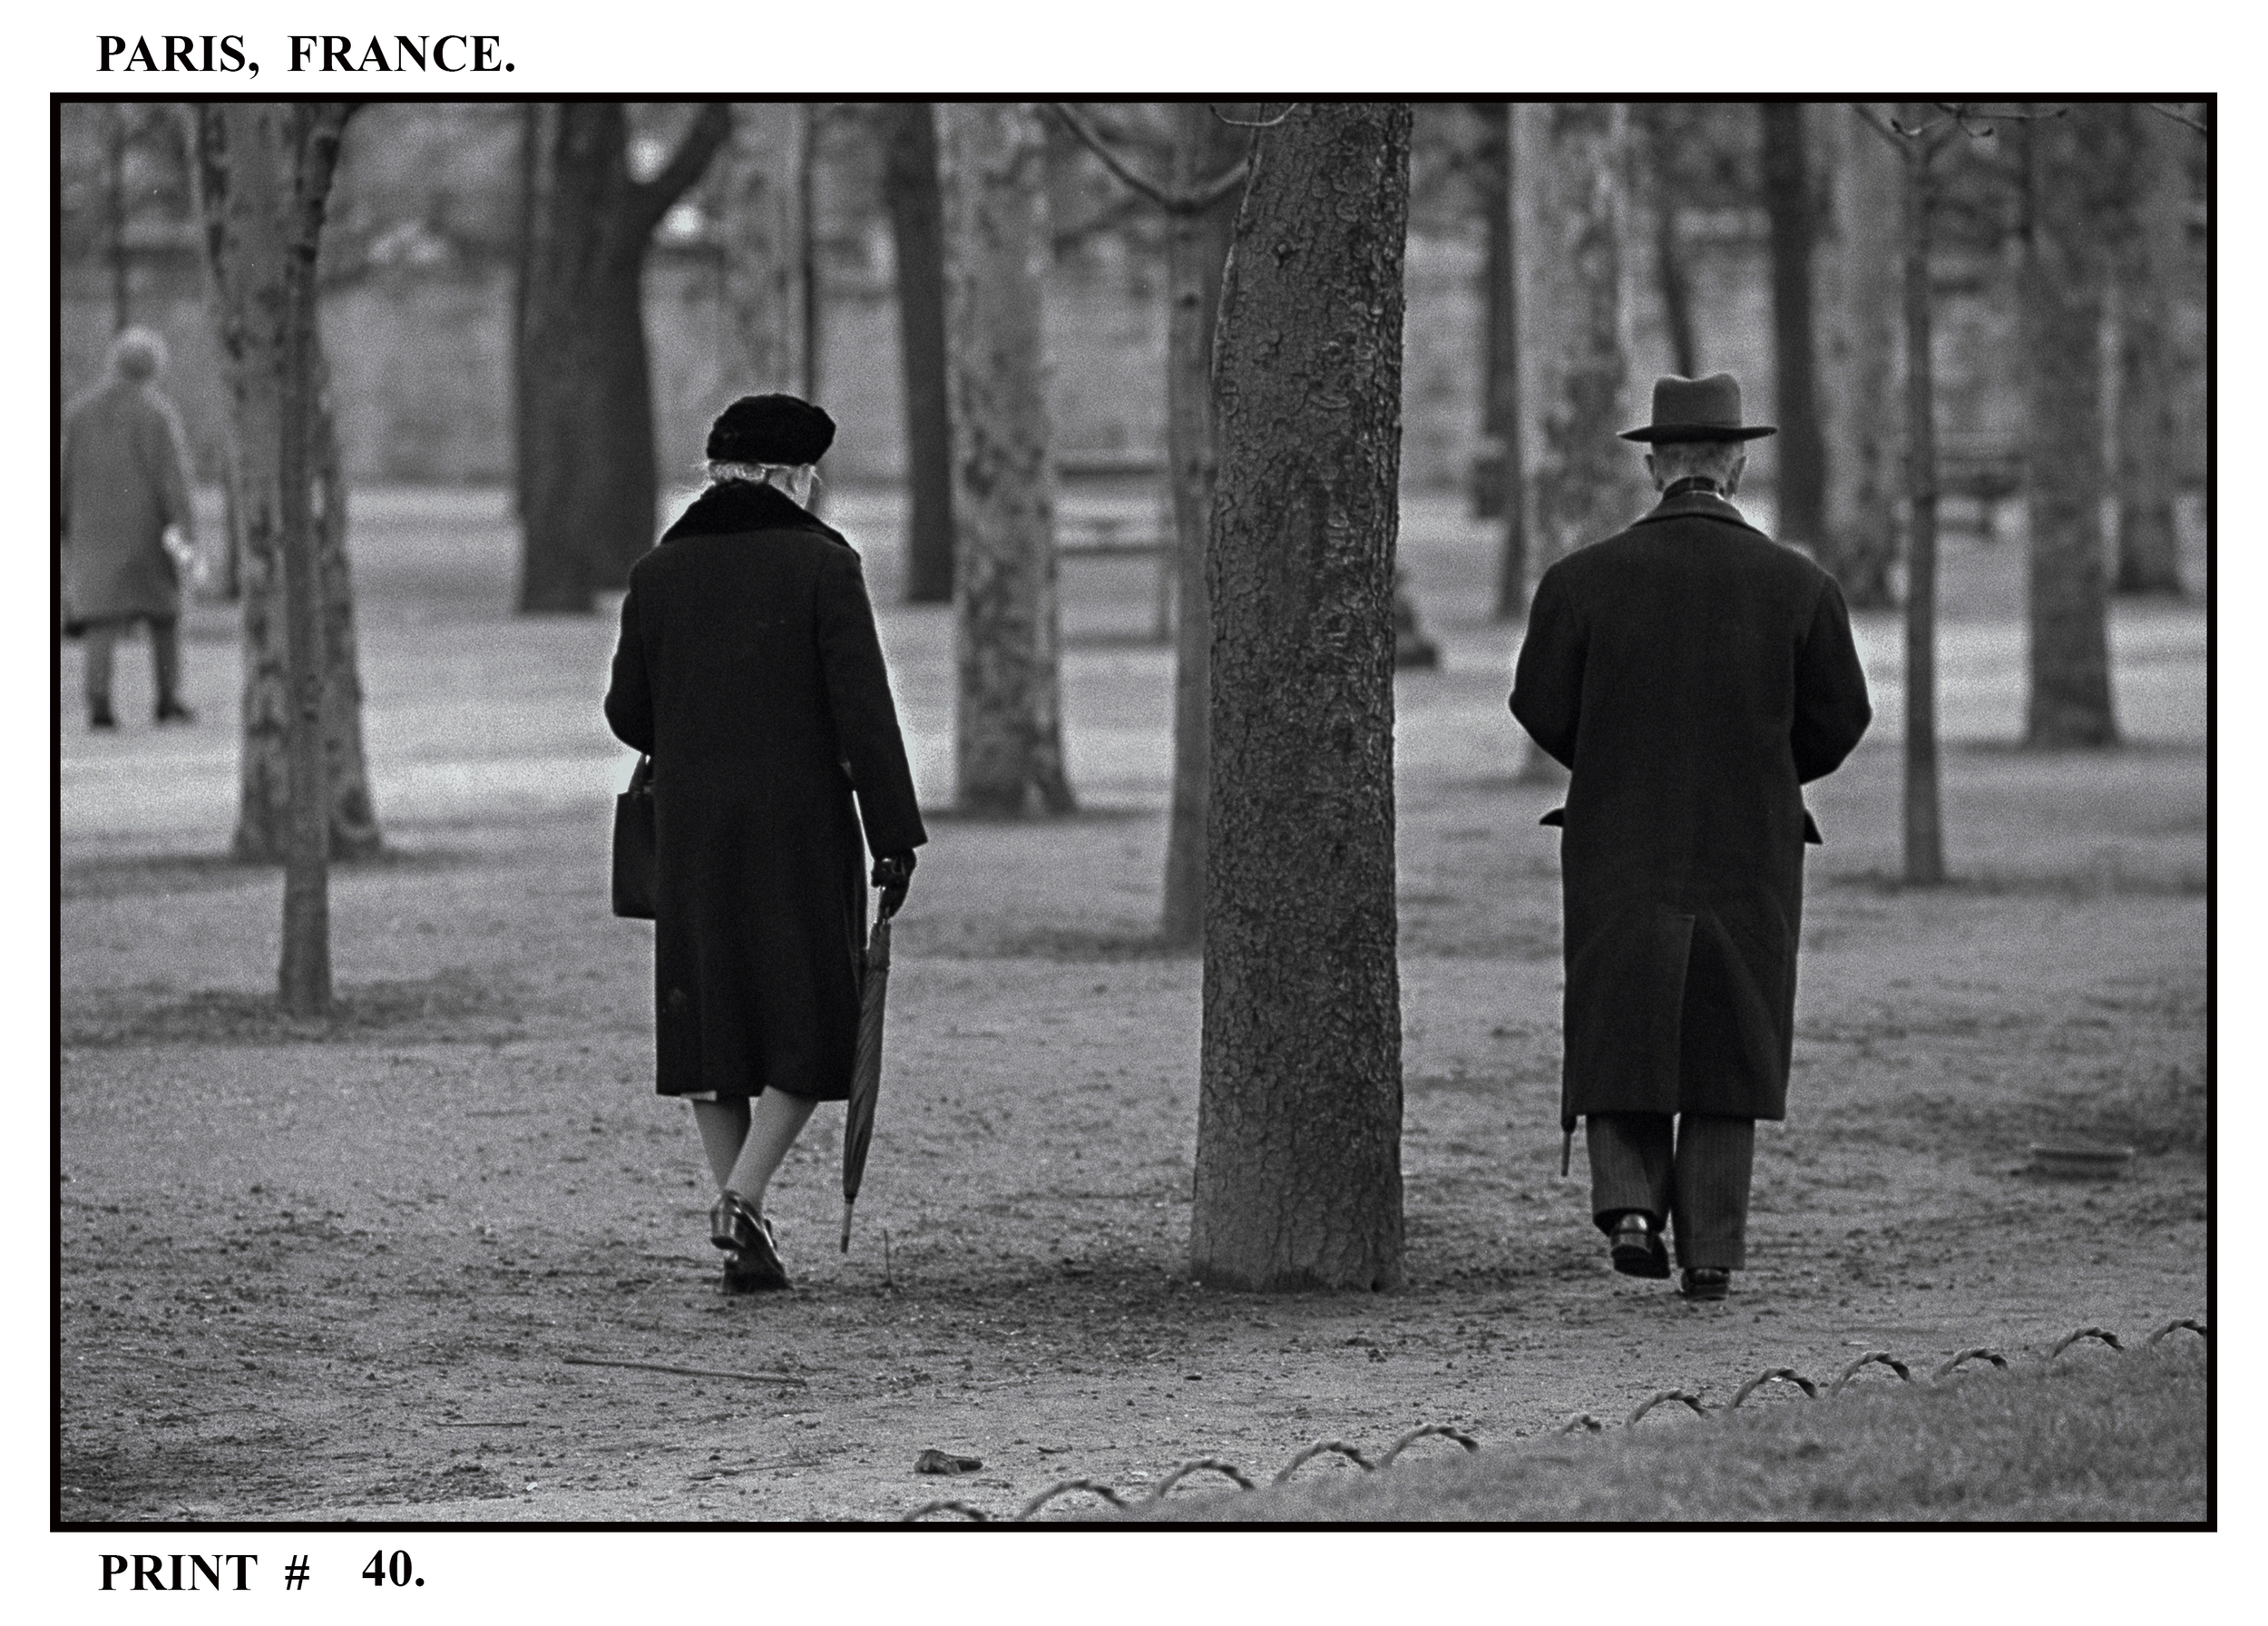 040PARIS, FRANCE copy.jpg